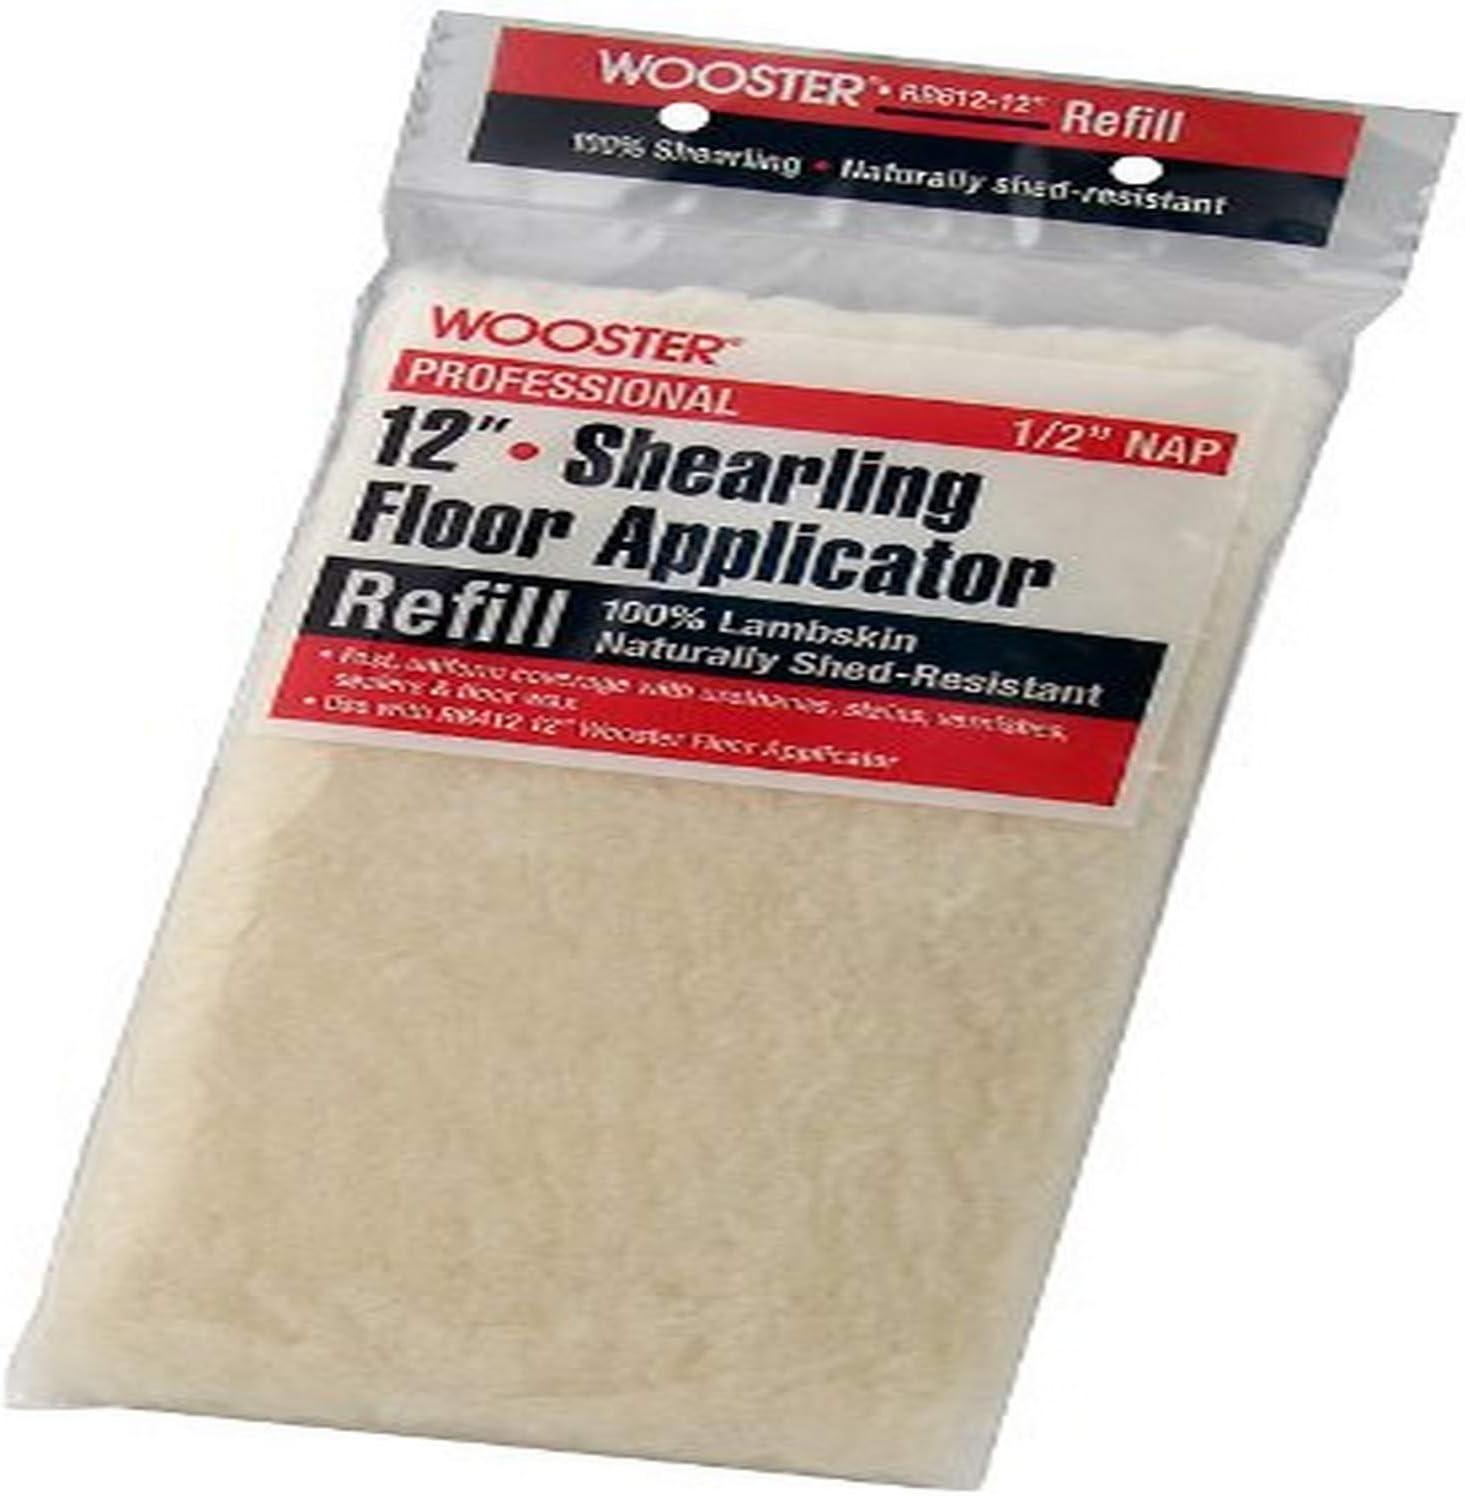 Wooster Brush RR612-12 Shearling Floor Applicator Refill 1/2-Inch Nap, 12-Inch